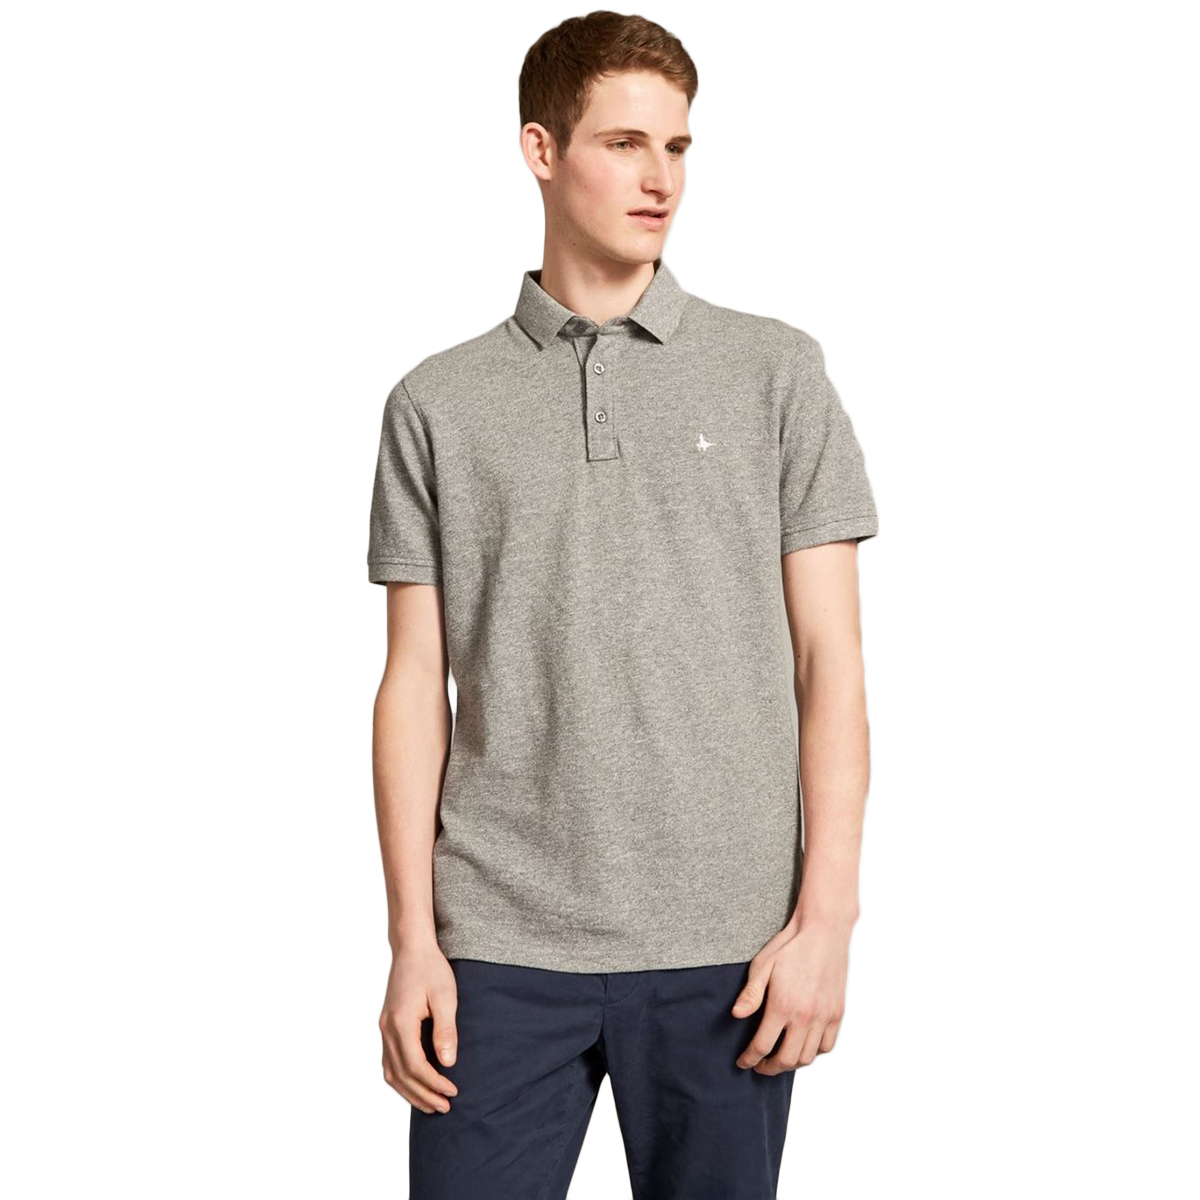 Jack Wills Men's Morley Jaspe Pique Short-Sleeve Polo - Black, M